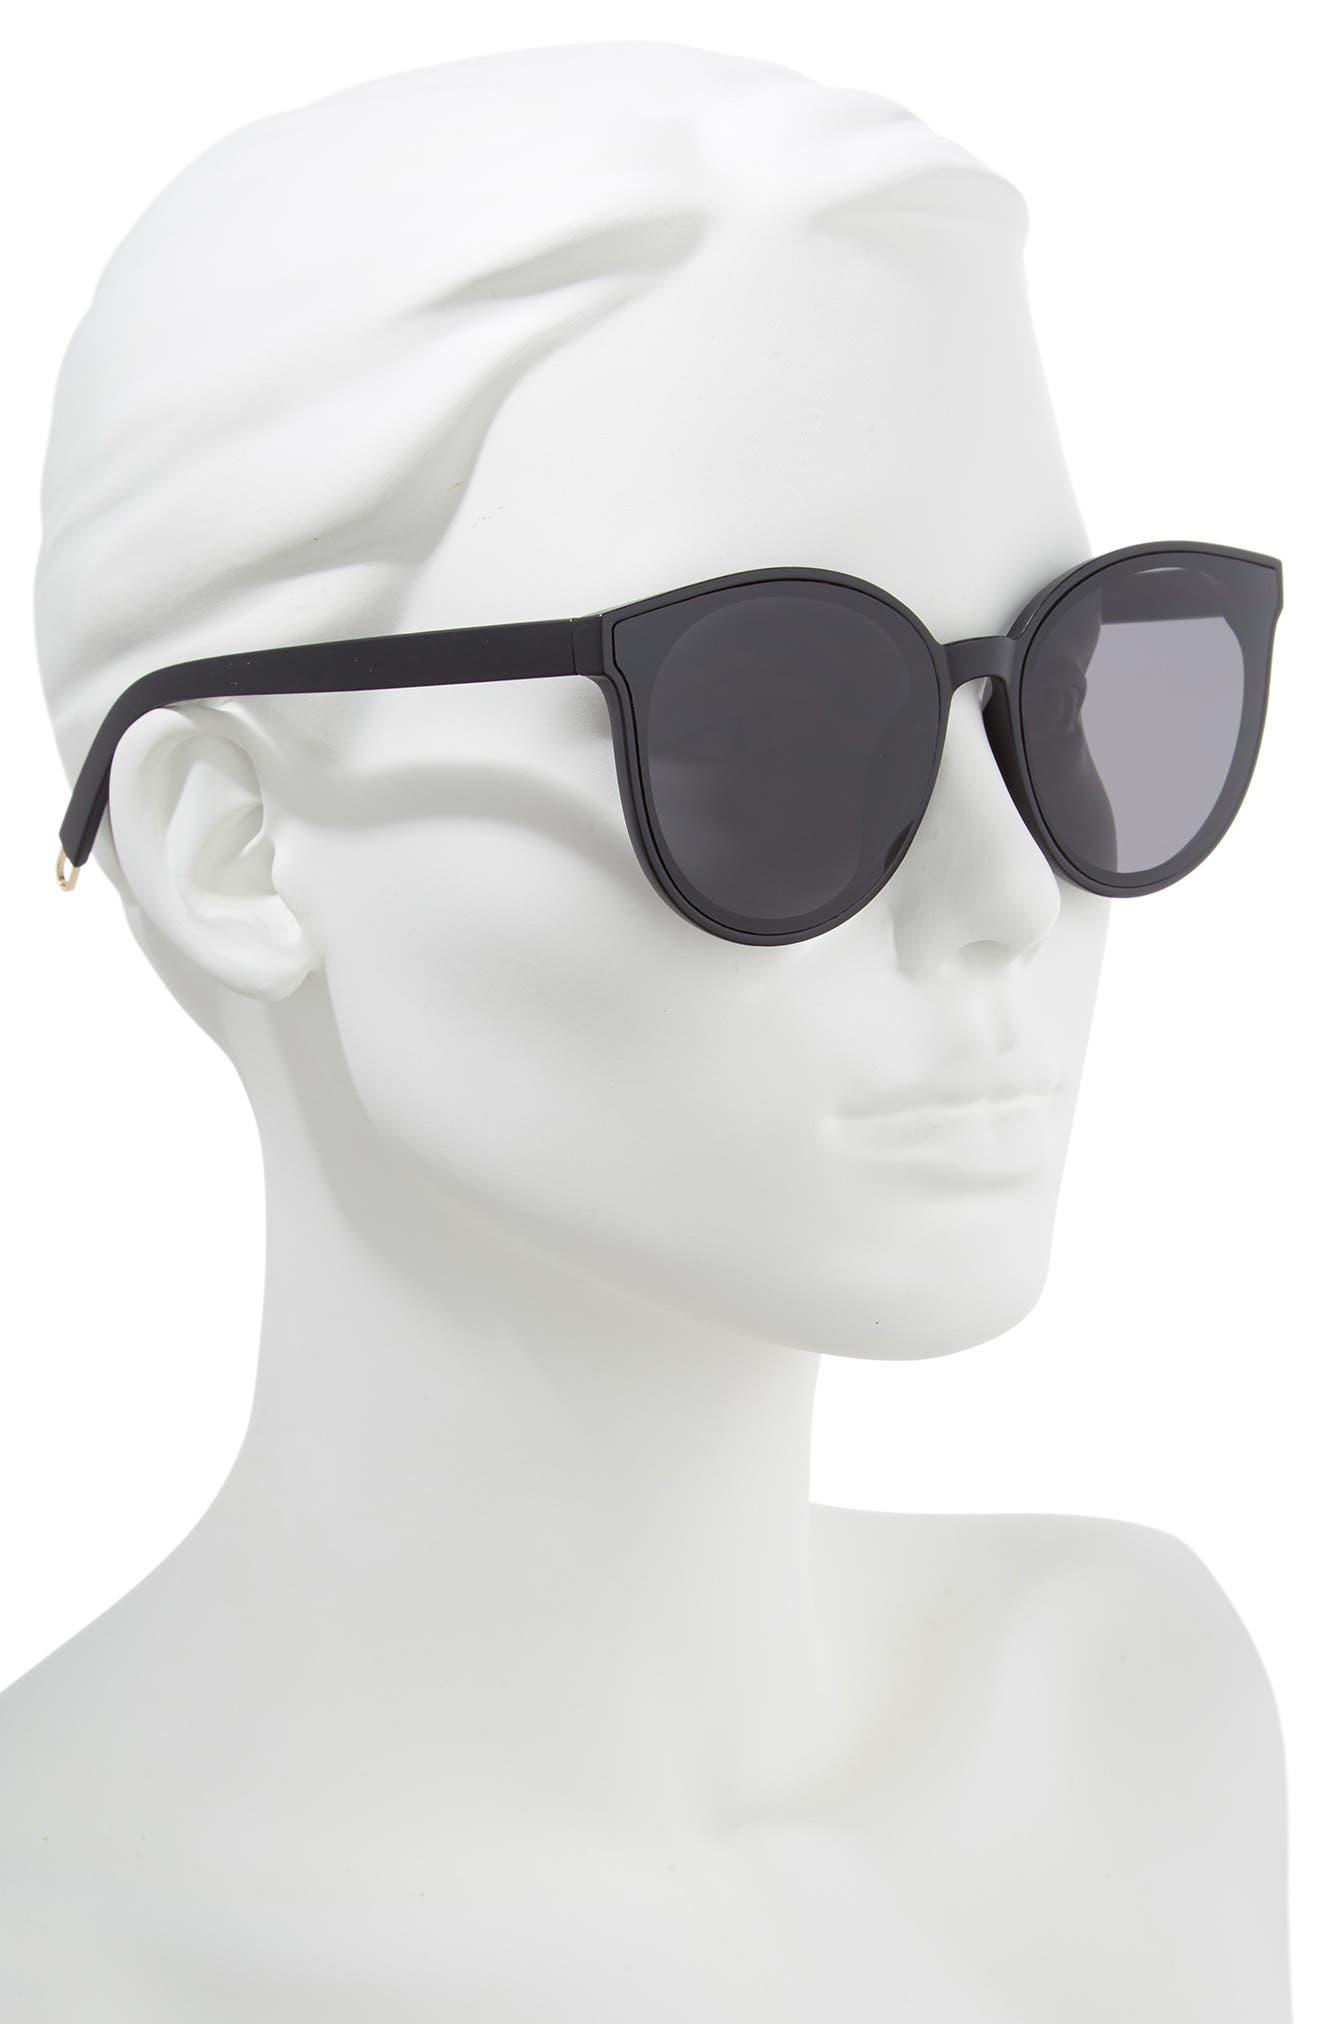 59mm Metal Tip Round Sunglasses,                             Alternate thumbnail 2, color,                             Black